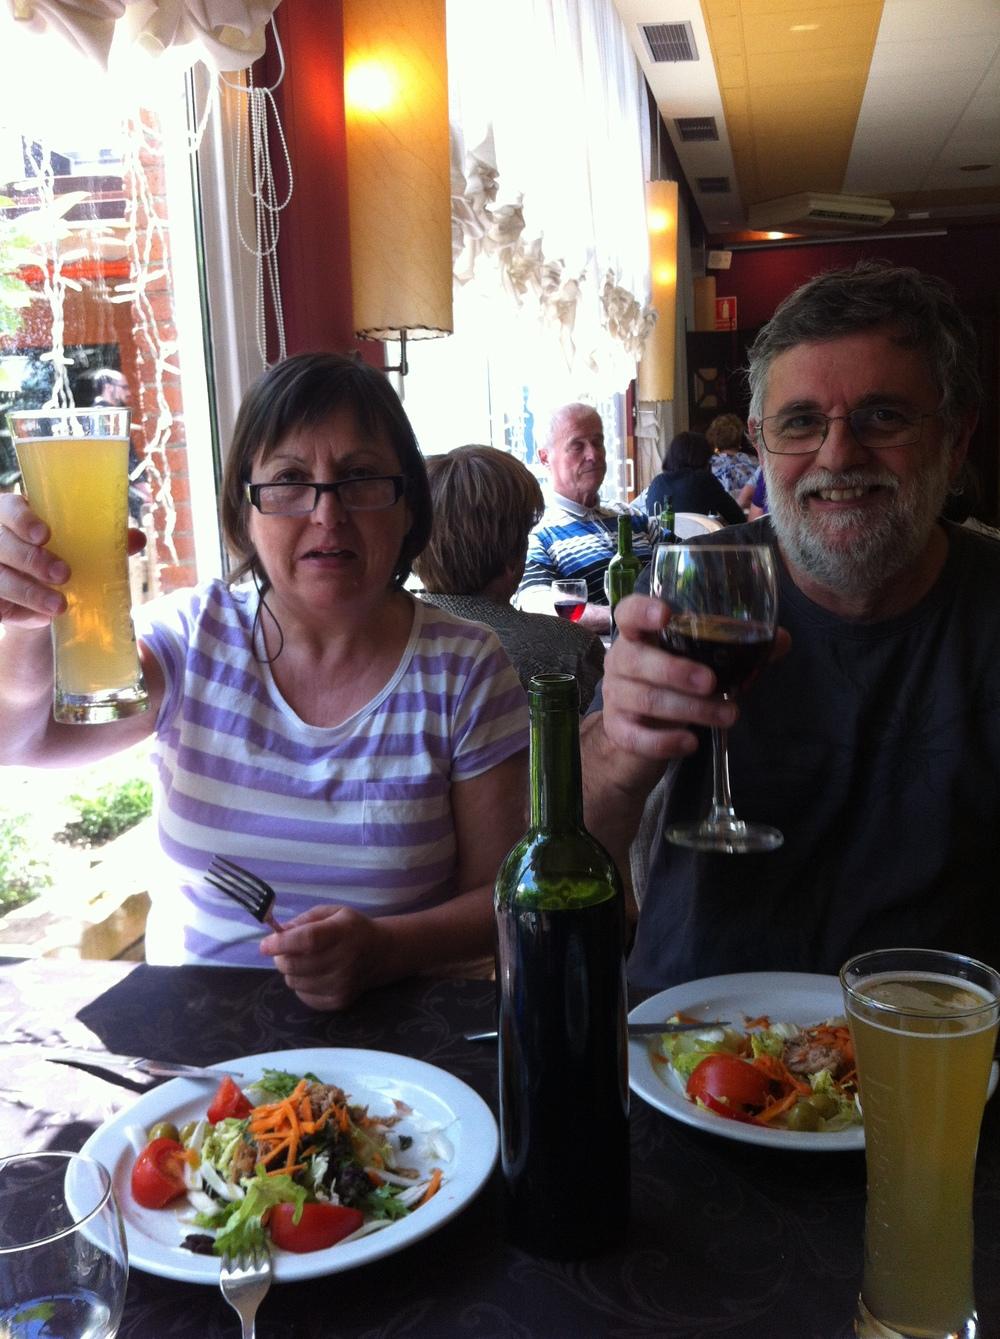 Clàudia and Jordi. Cheers